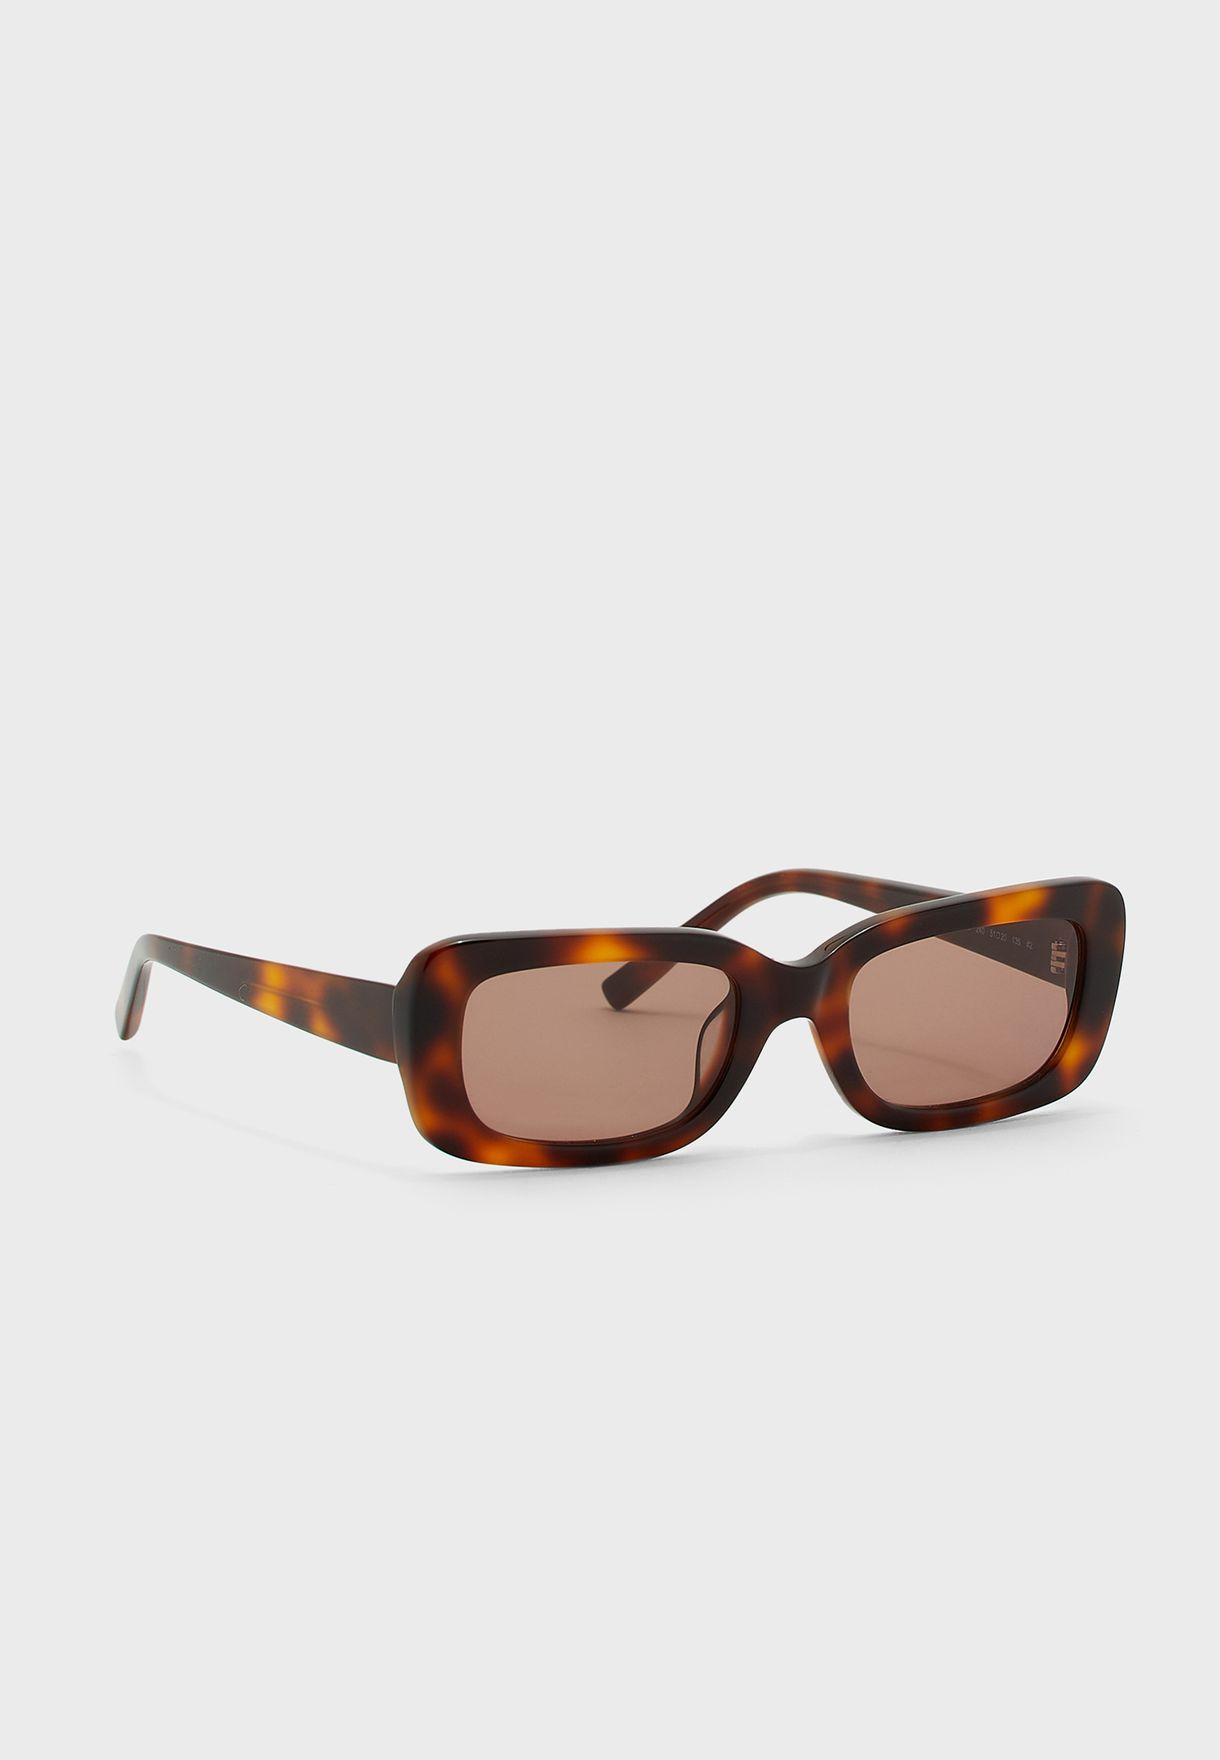 DK514S Wayfarer Sunglasses